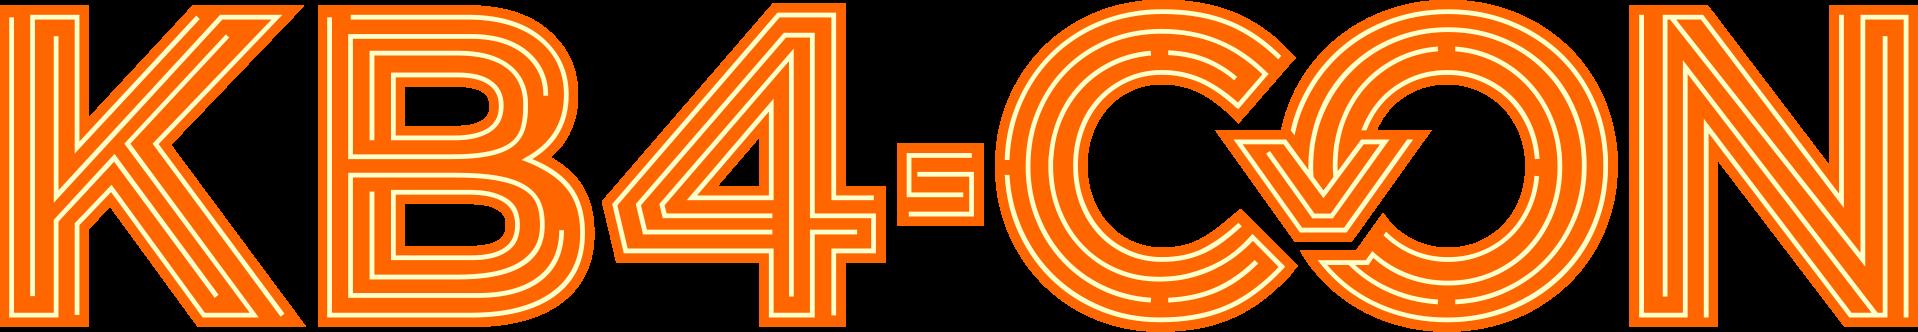 KB4CON-HEADER-LOGO4